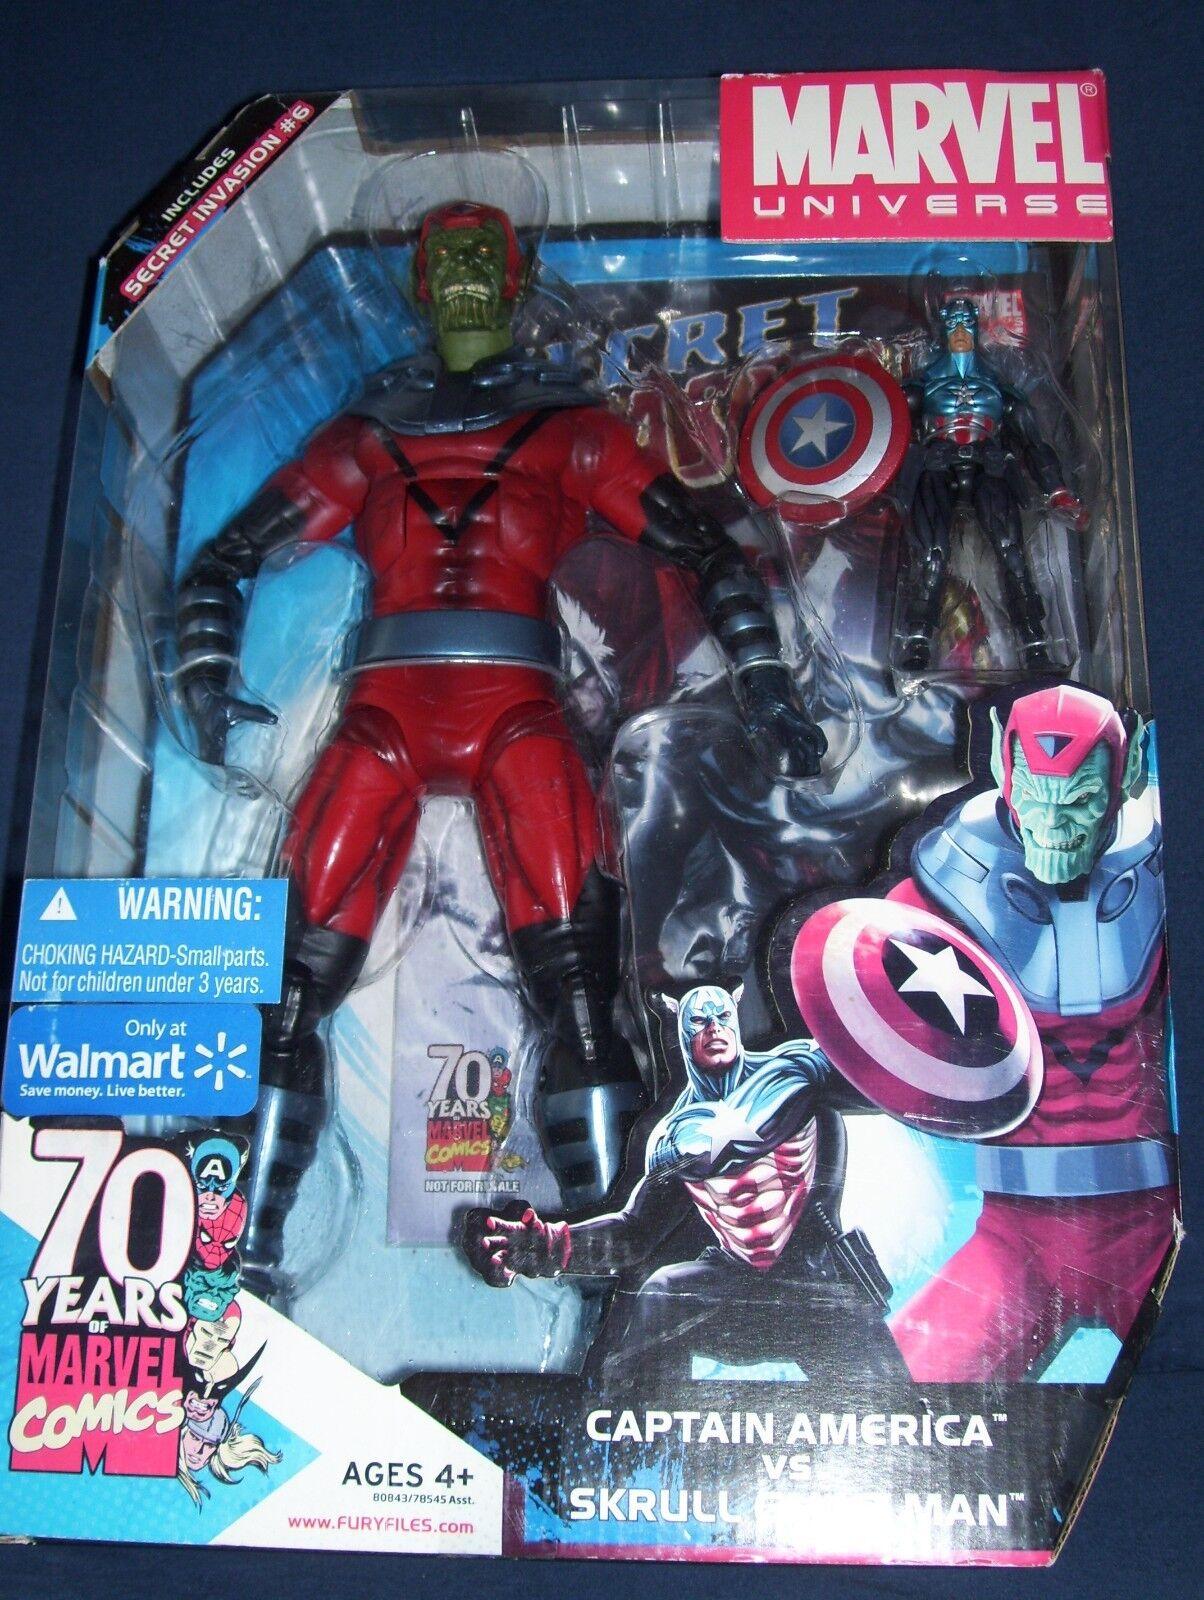 Marvel universo Capitán América Vs. Skrull Giant Man Walmart Exclusivos, Nuevos En Caja